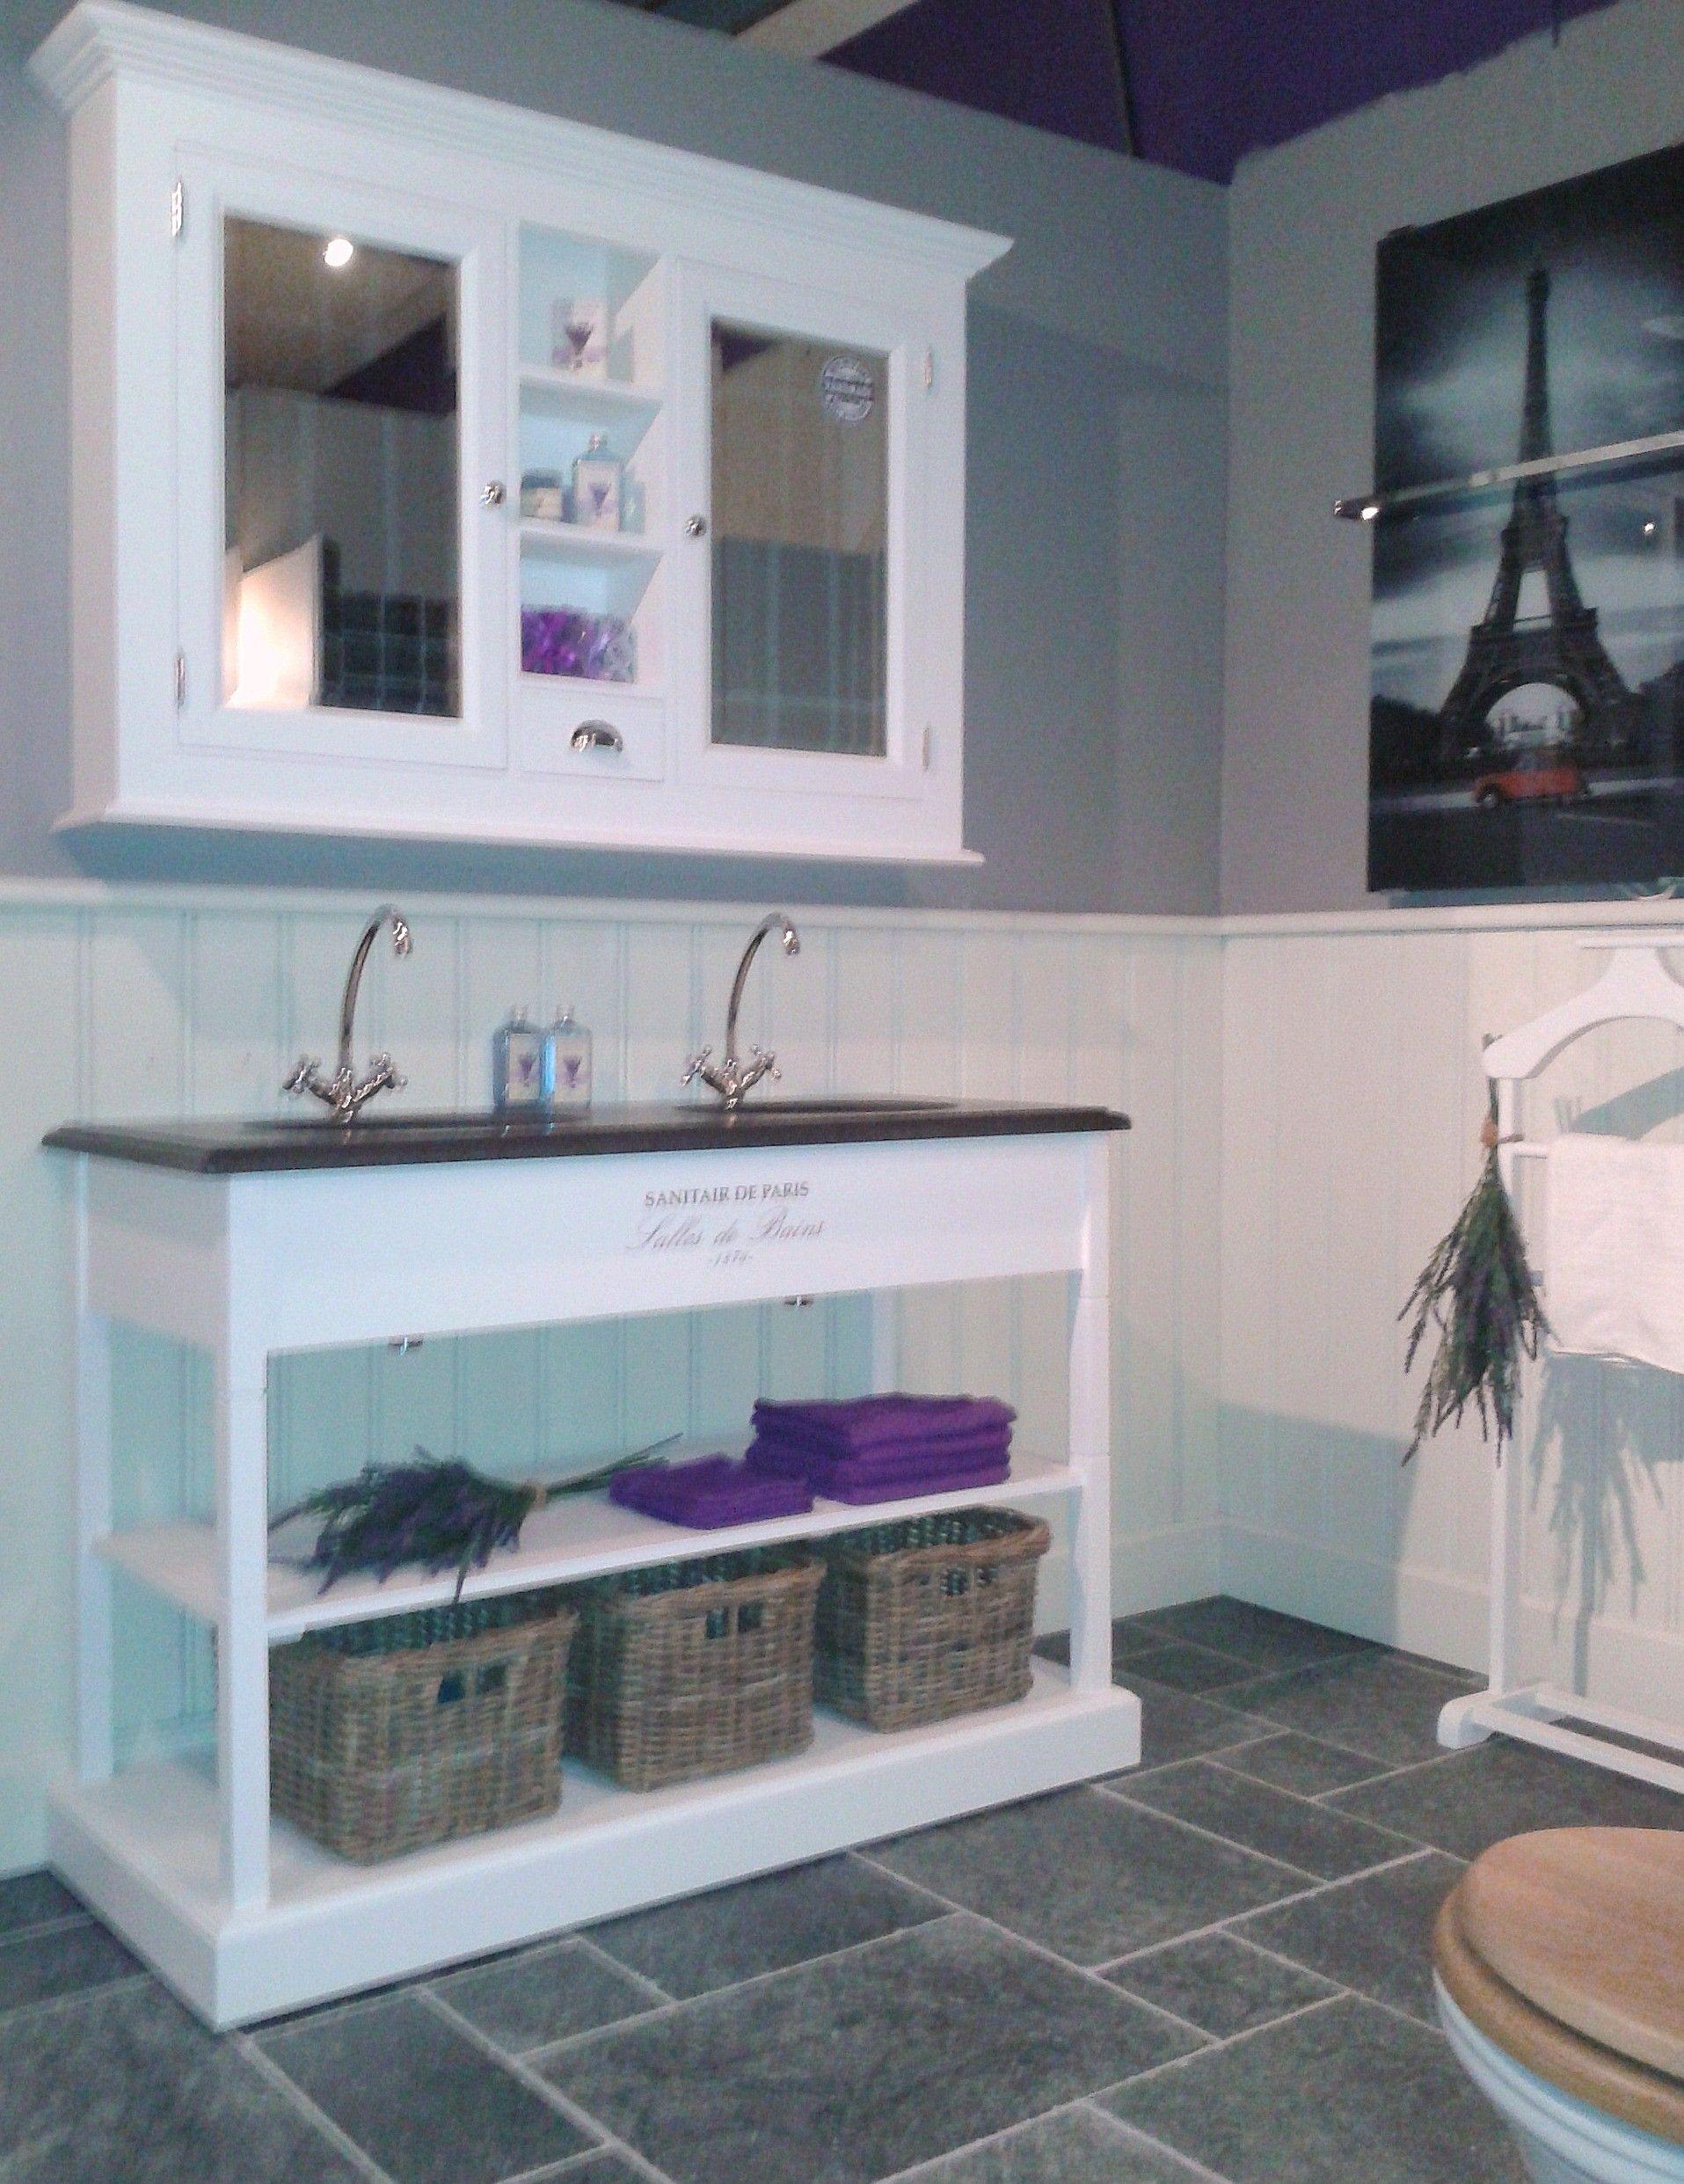 sanitaire de paris 130 cm badkamer meubel van heck experience